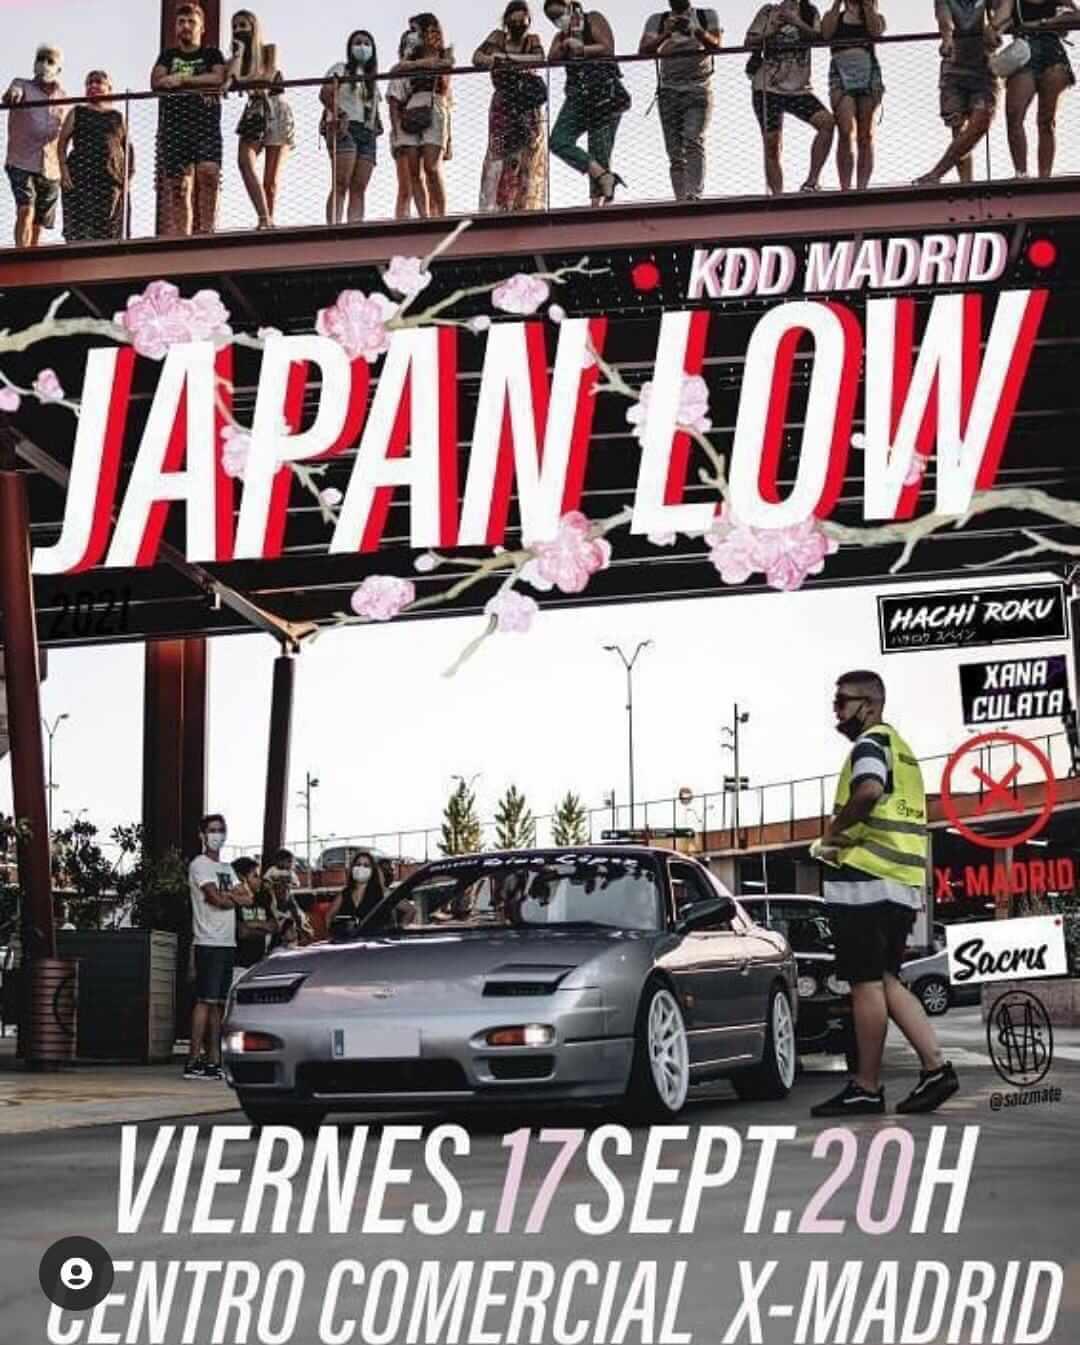 KDD Japan Low en Madrid